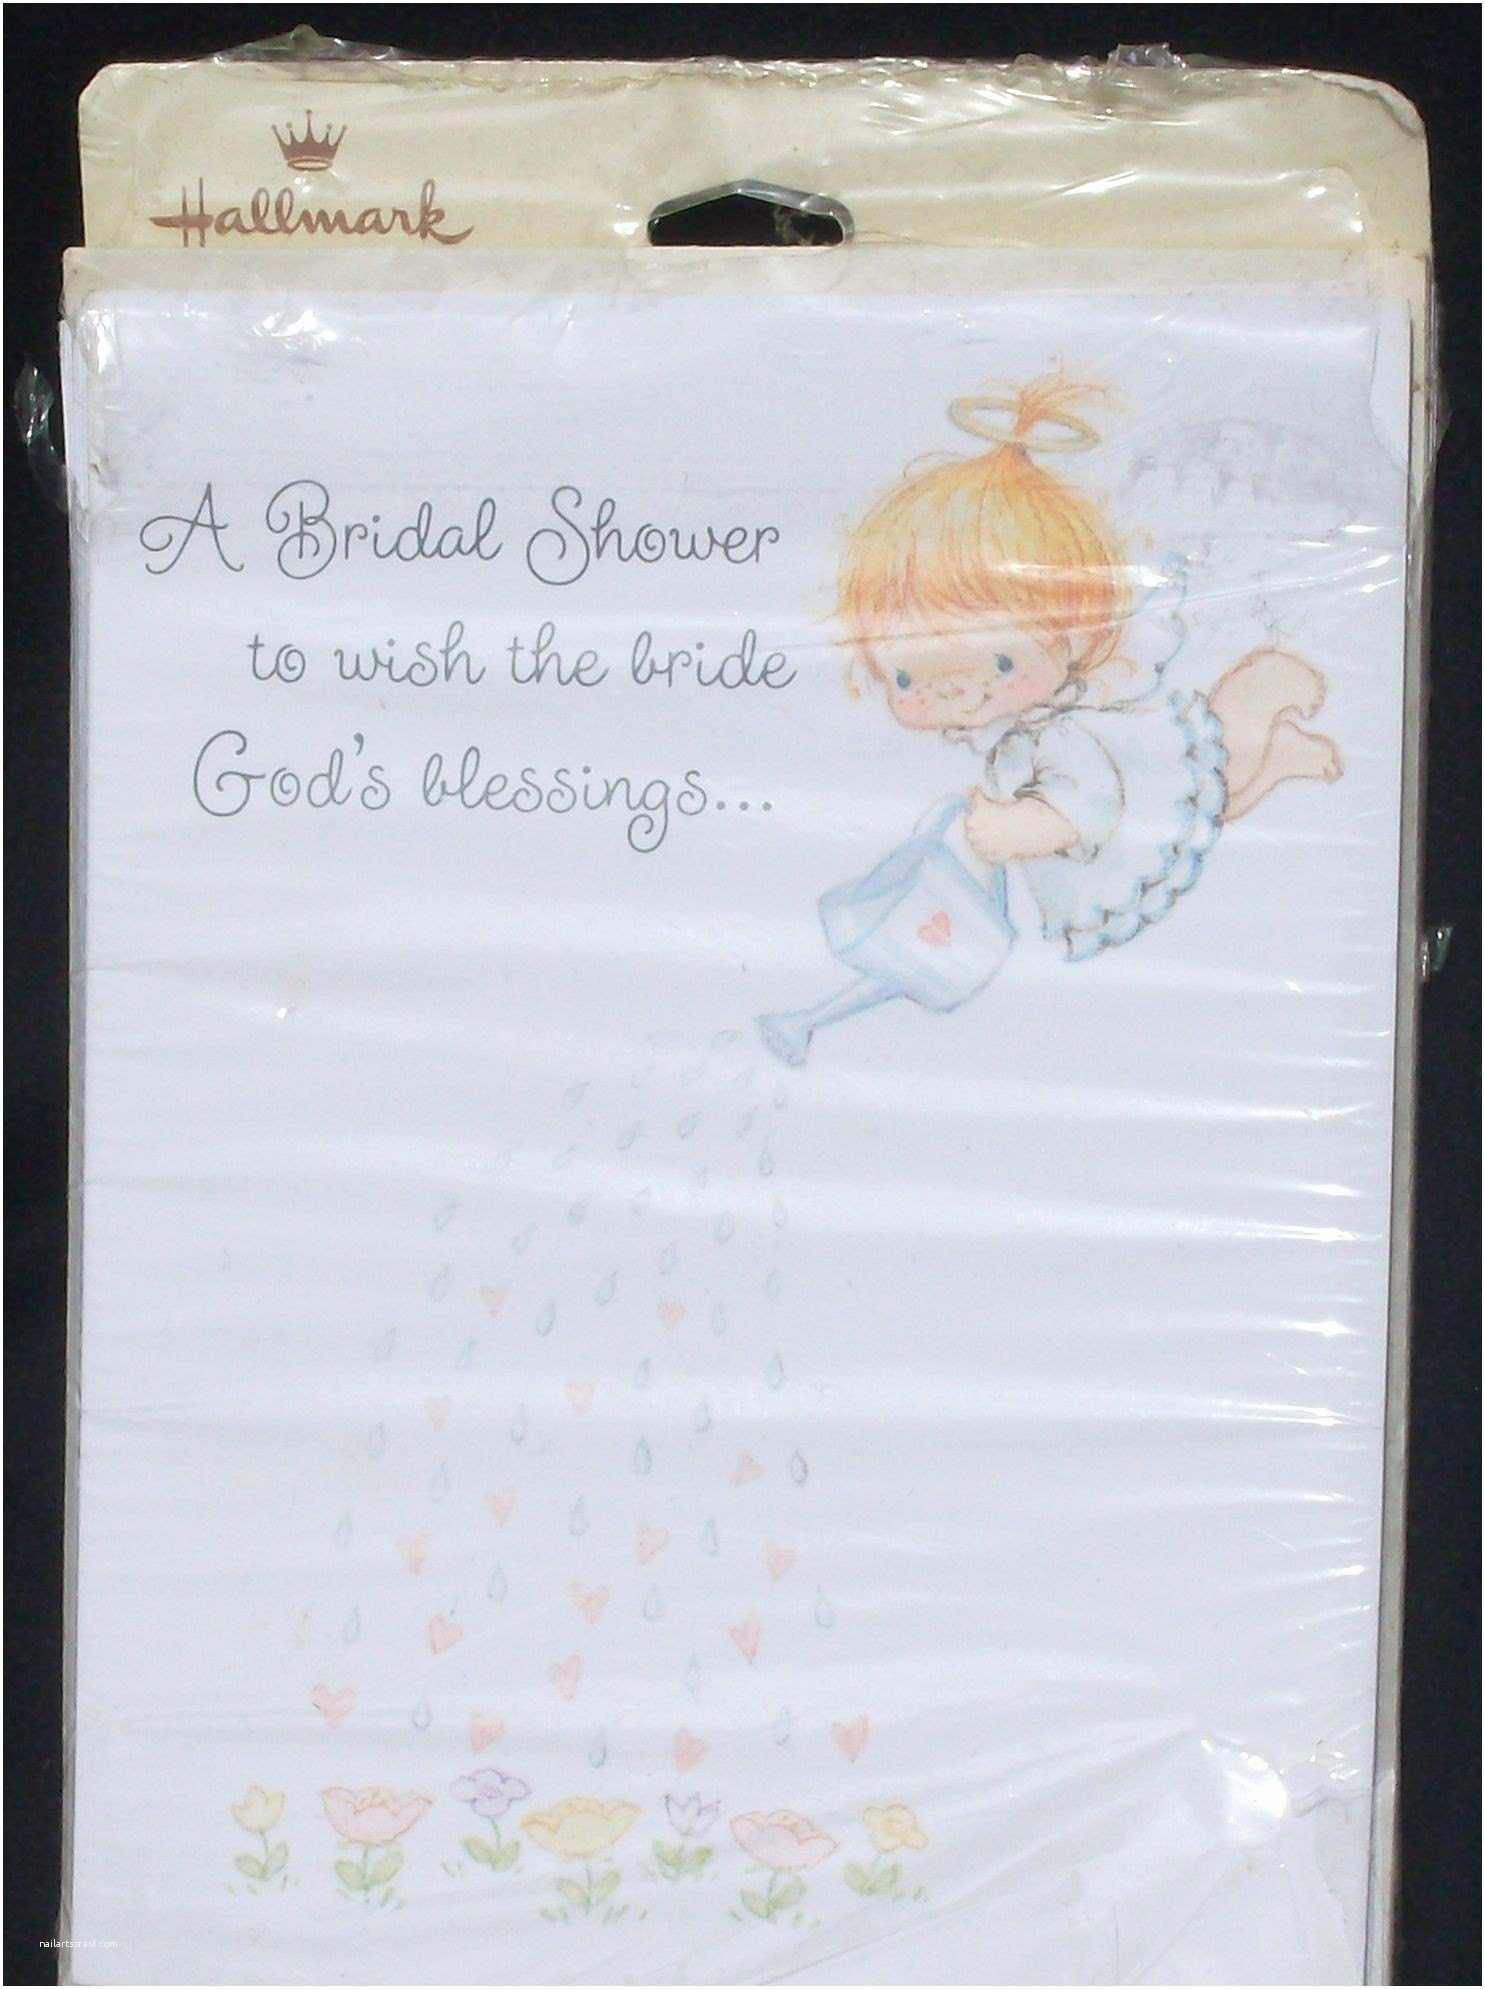 Hallmark Wedding Invitations Bridal Shower Invitations Hallmark Bridal Shower